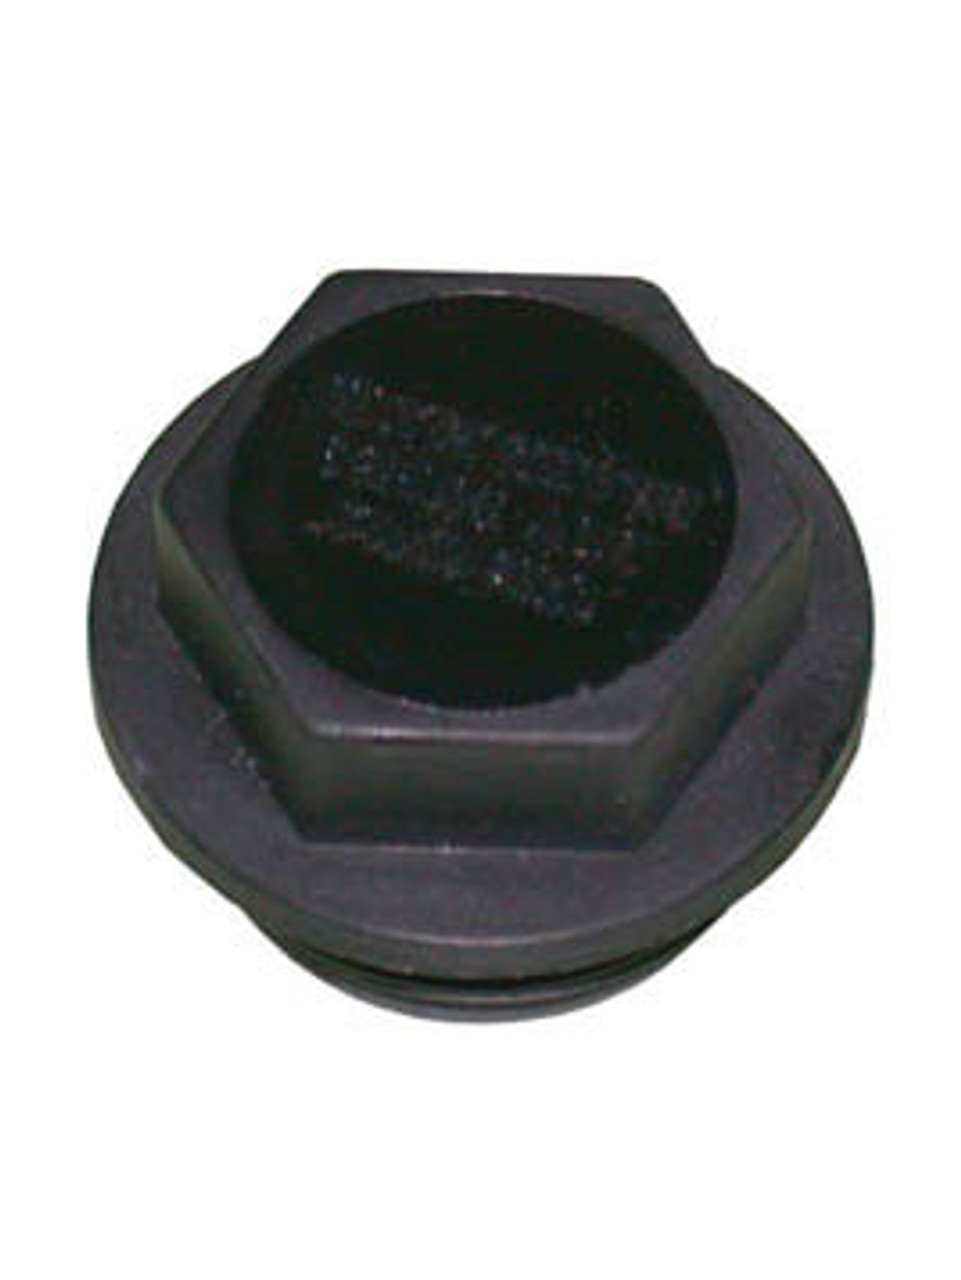 23388-01 --- Model 60 Actuator Master Cylinder Cap